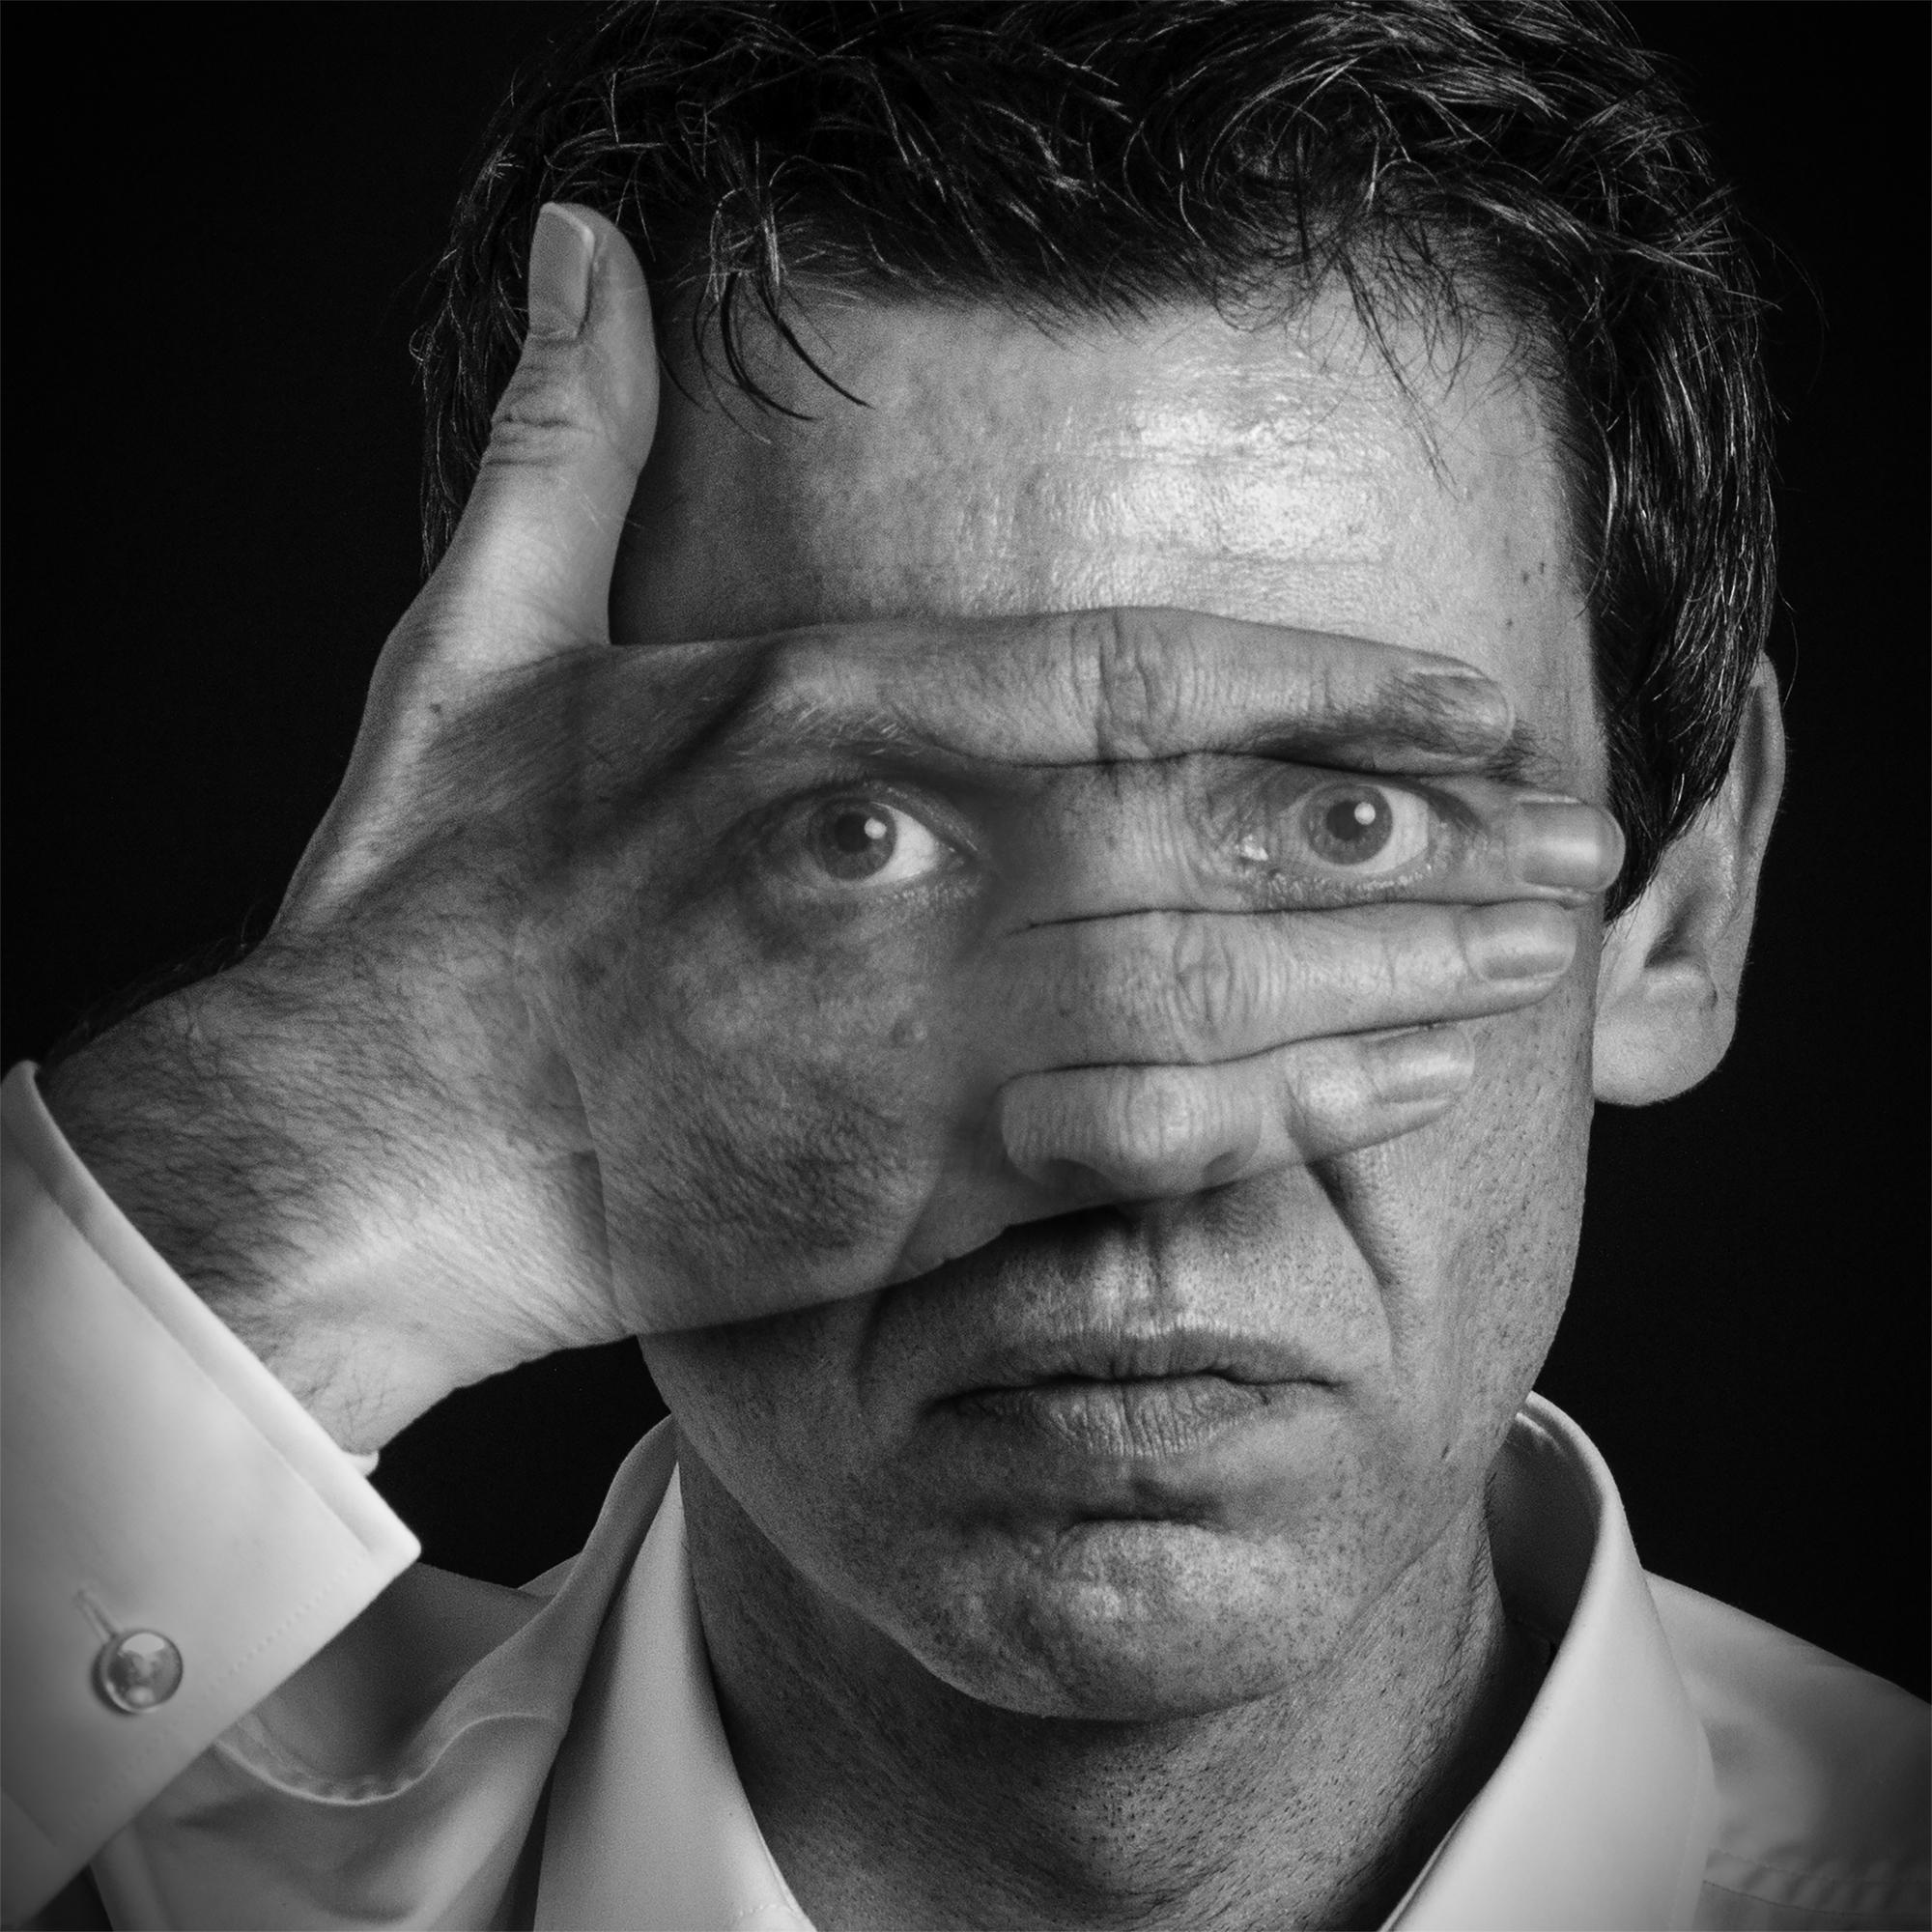 Martin Lindermaier